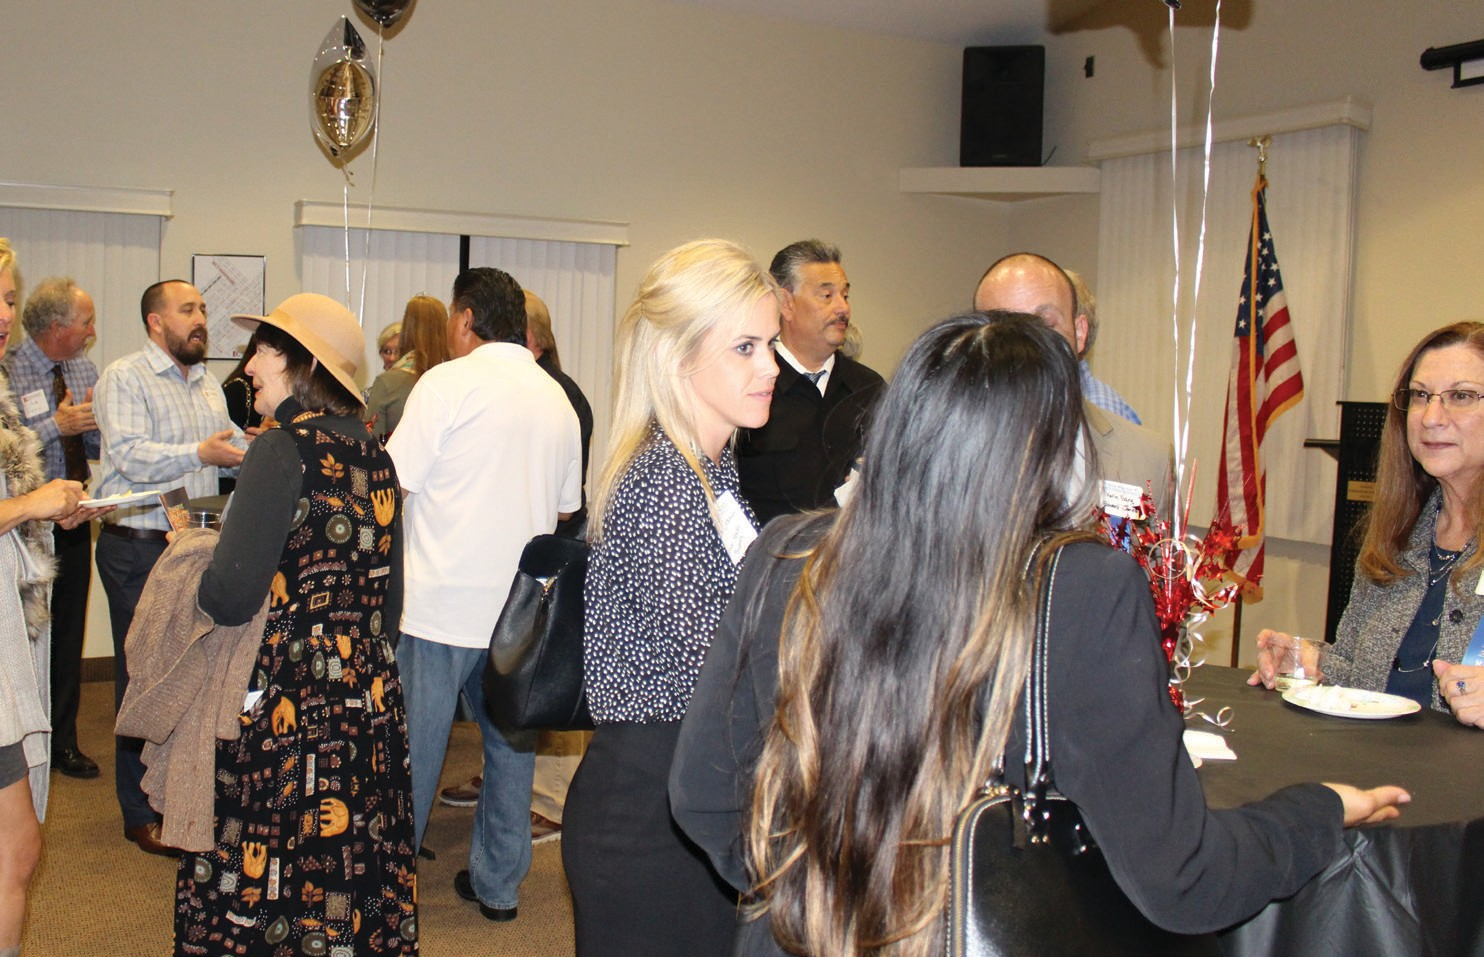 Left to right: Lill Litschewski, CSSM/Board member (blond lady) speaking with Marie Schwab, Allbrand Toner (member).